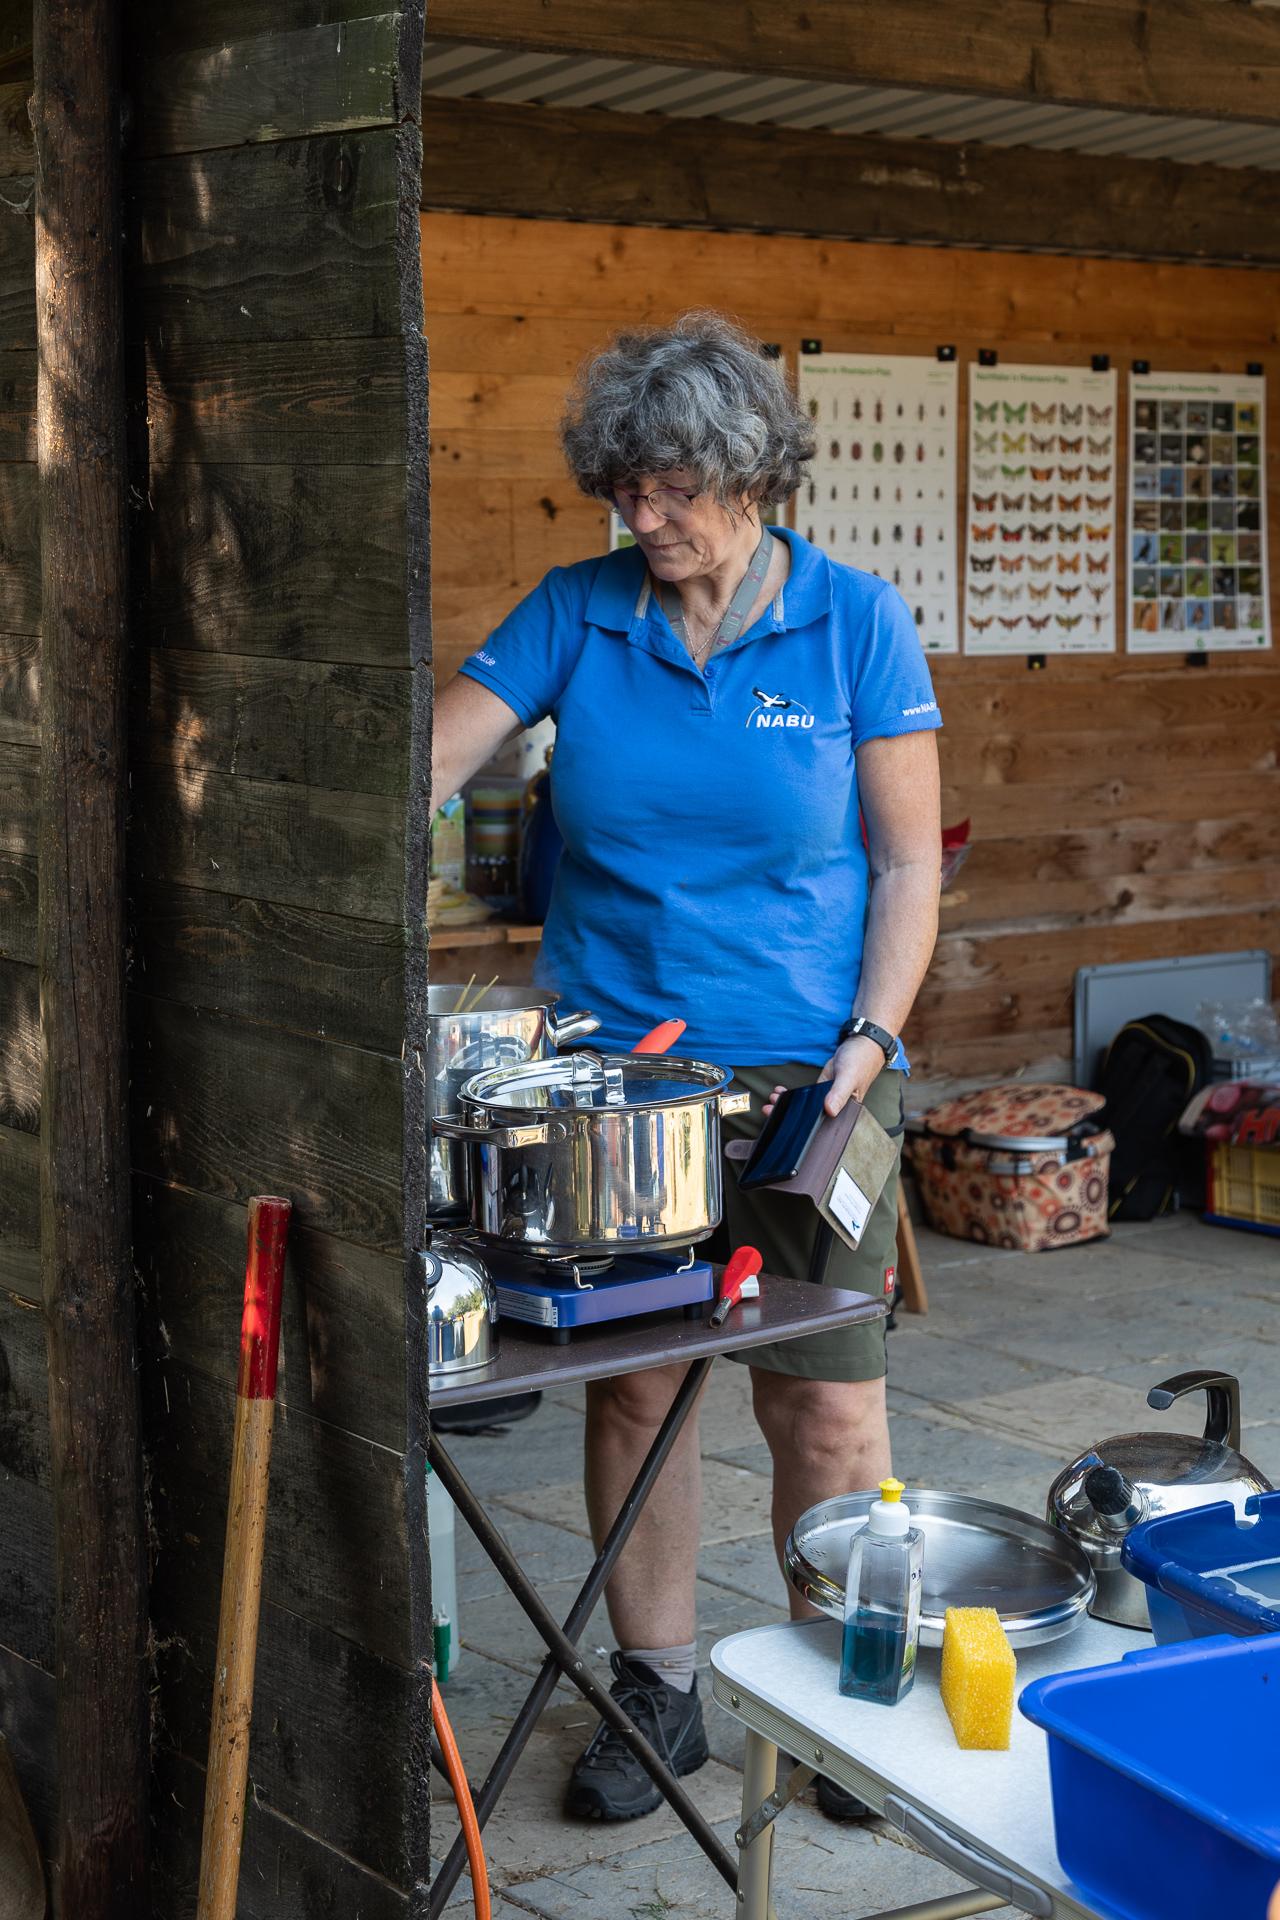 Marianne Theis-Prodöhl bei der Zubereitung der Spaghetti Bolognese (Foto: Andreas Sebald)